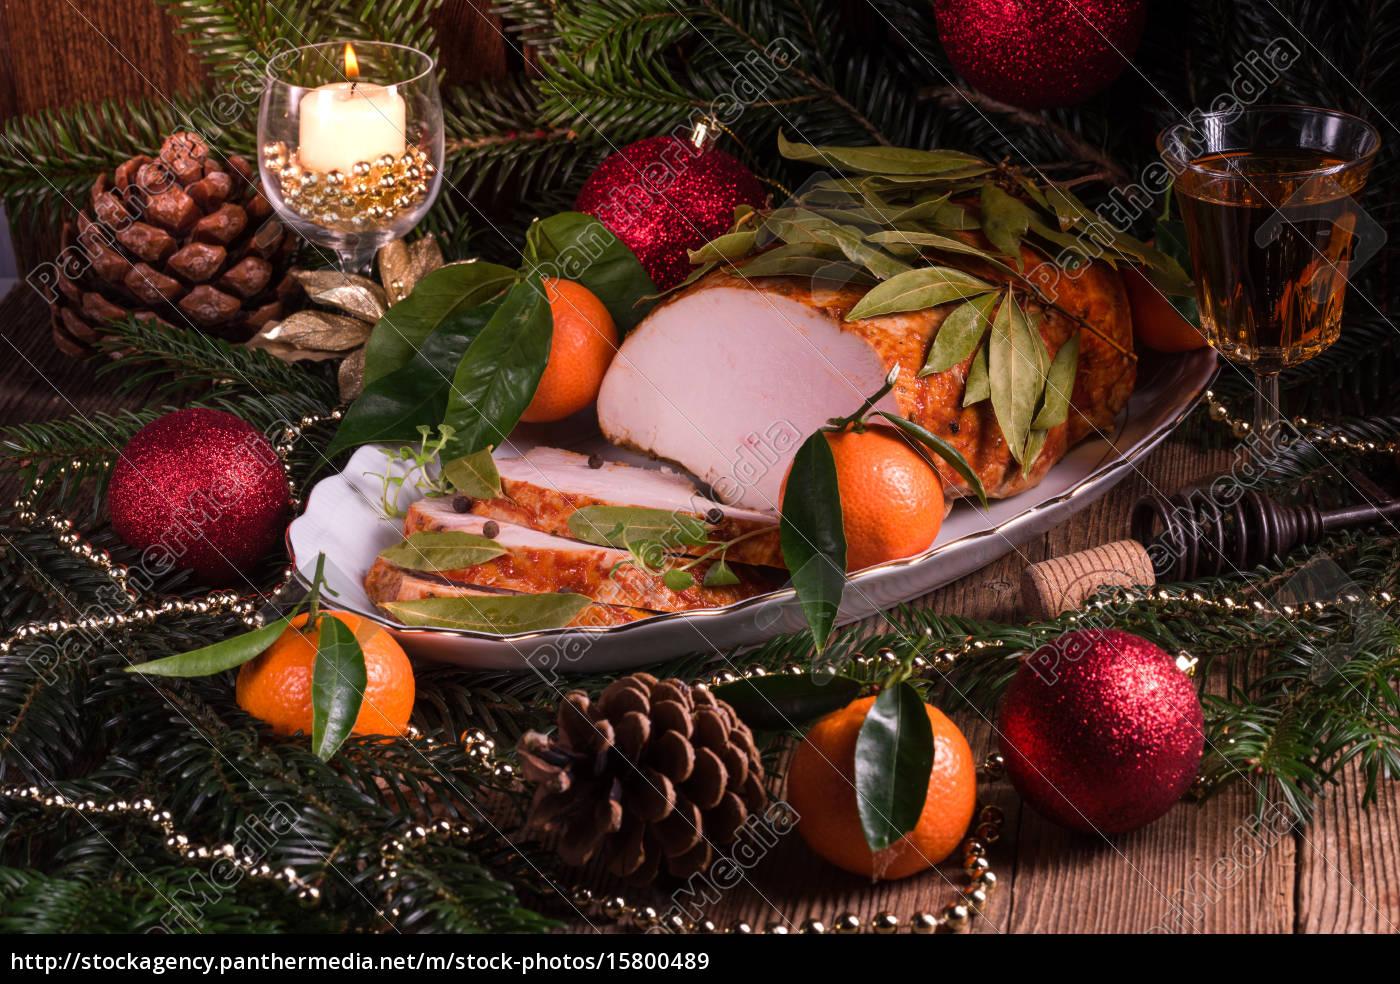 aromatic, turkey, roast, in, piquant, marinade - 15800489